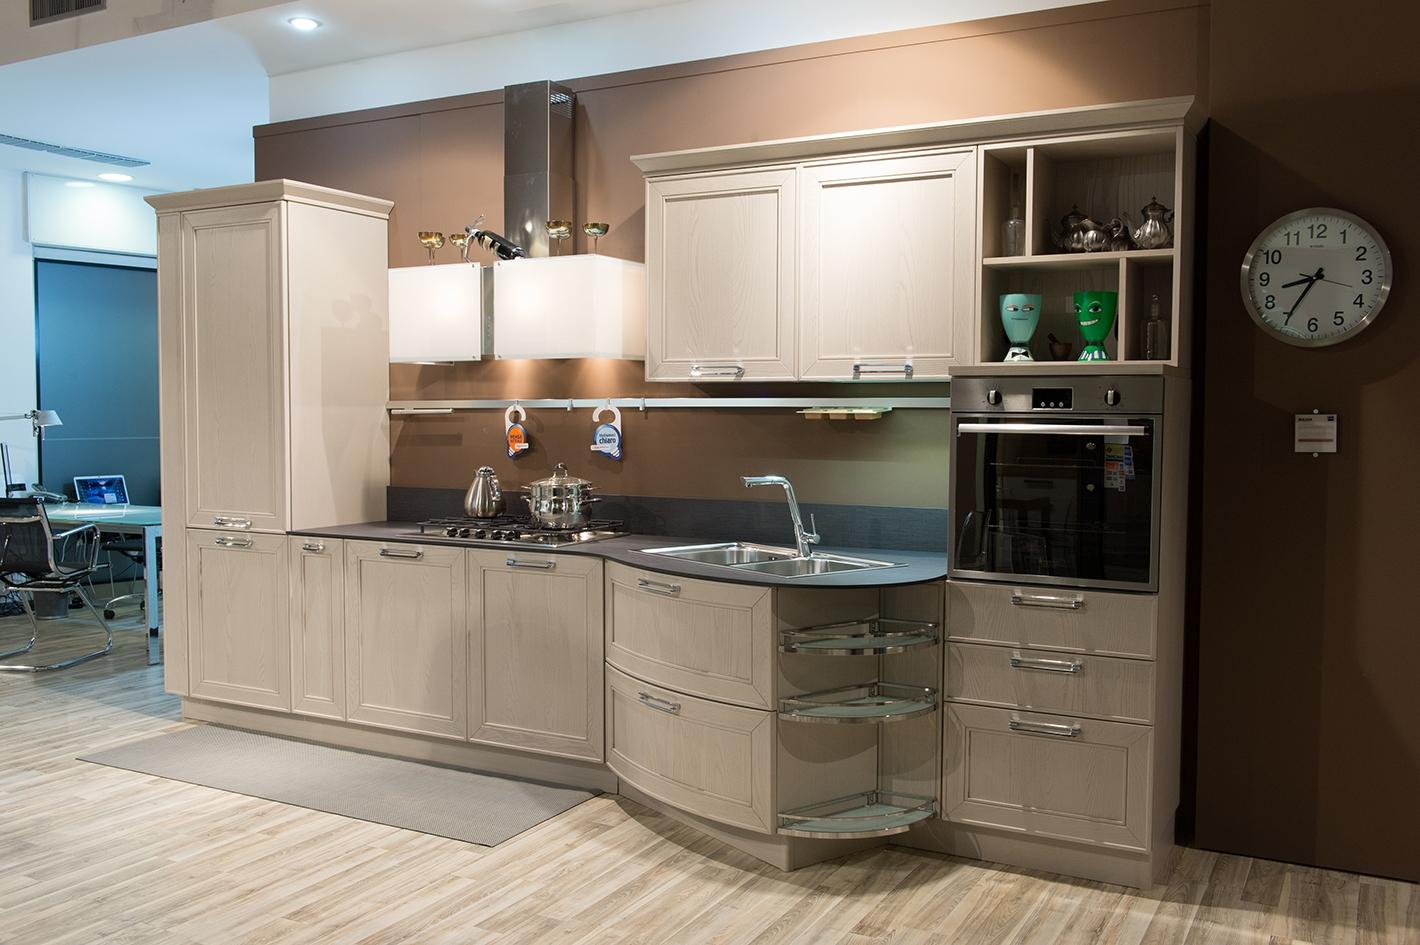 Cucina stosa mod maxim completa di elettrodomestici - Disposizione elettrodomestici cucina ...